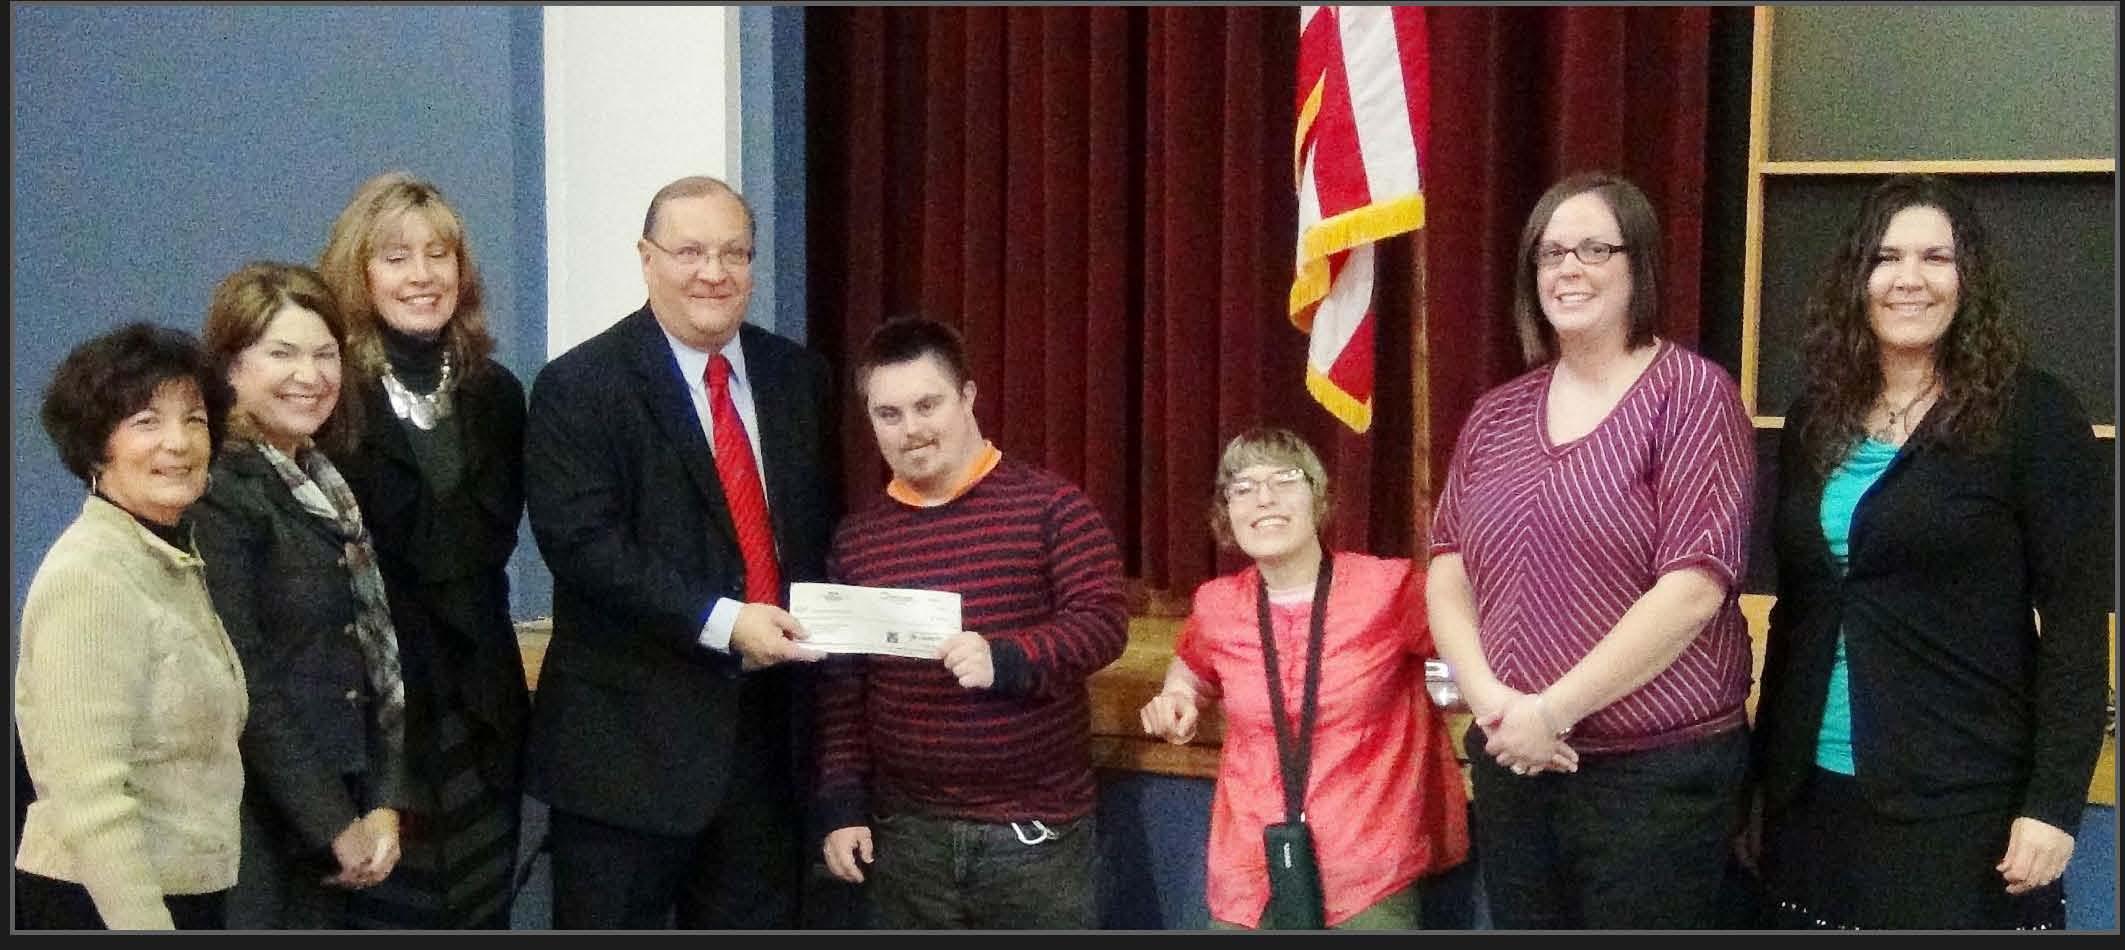 MiCTA Grant Presentation Rochester Community Schools Special Education Department S.T.E.P.S.